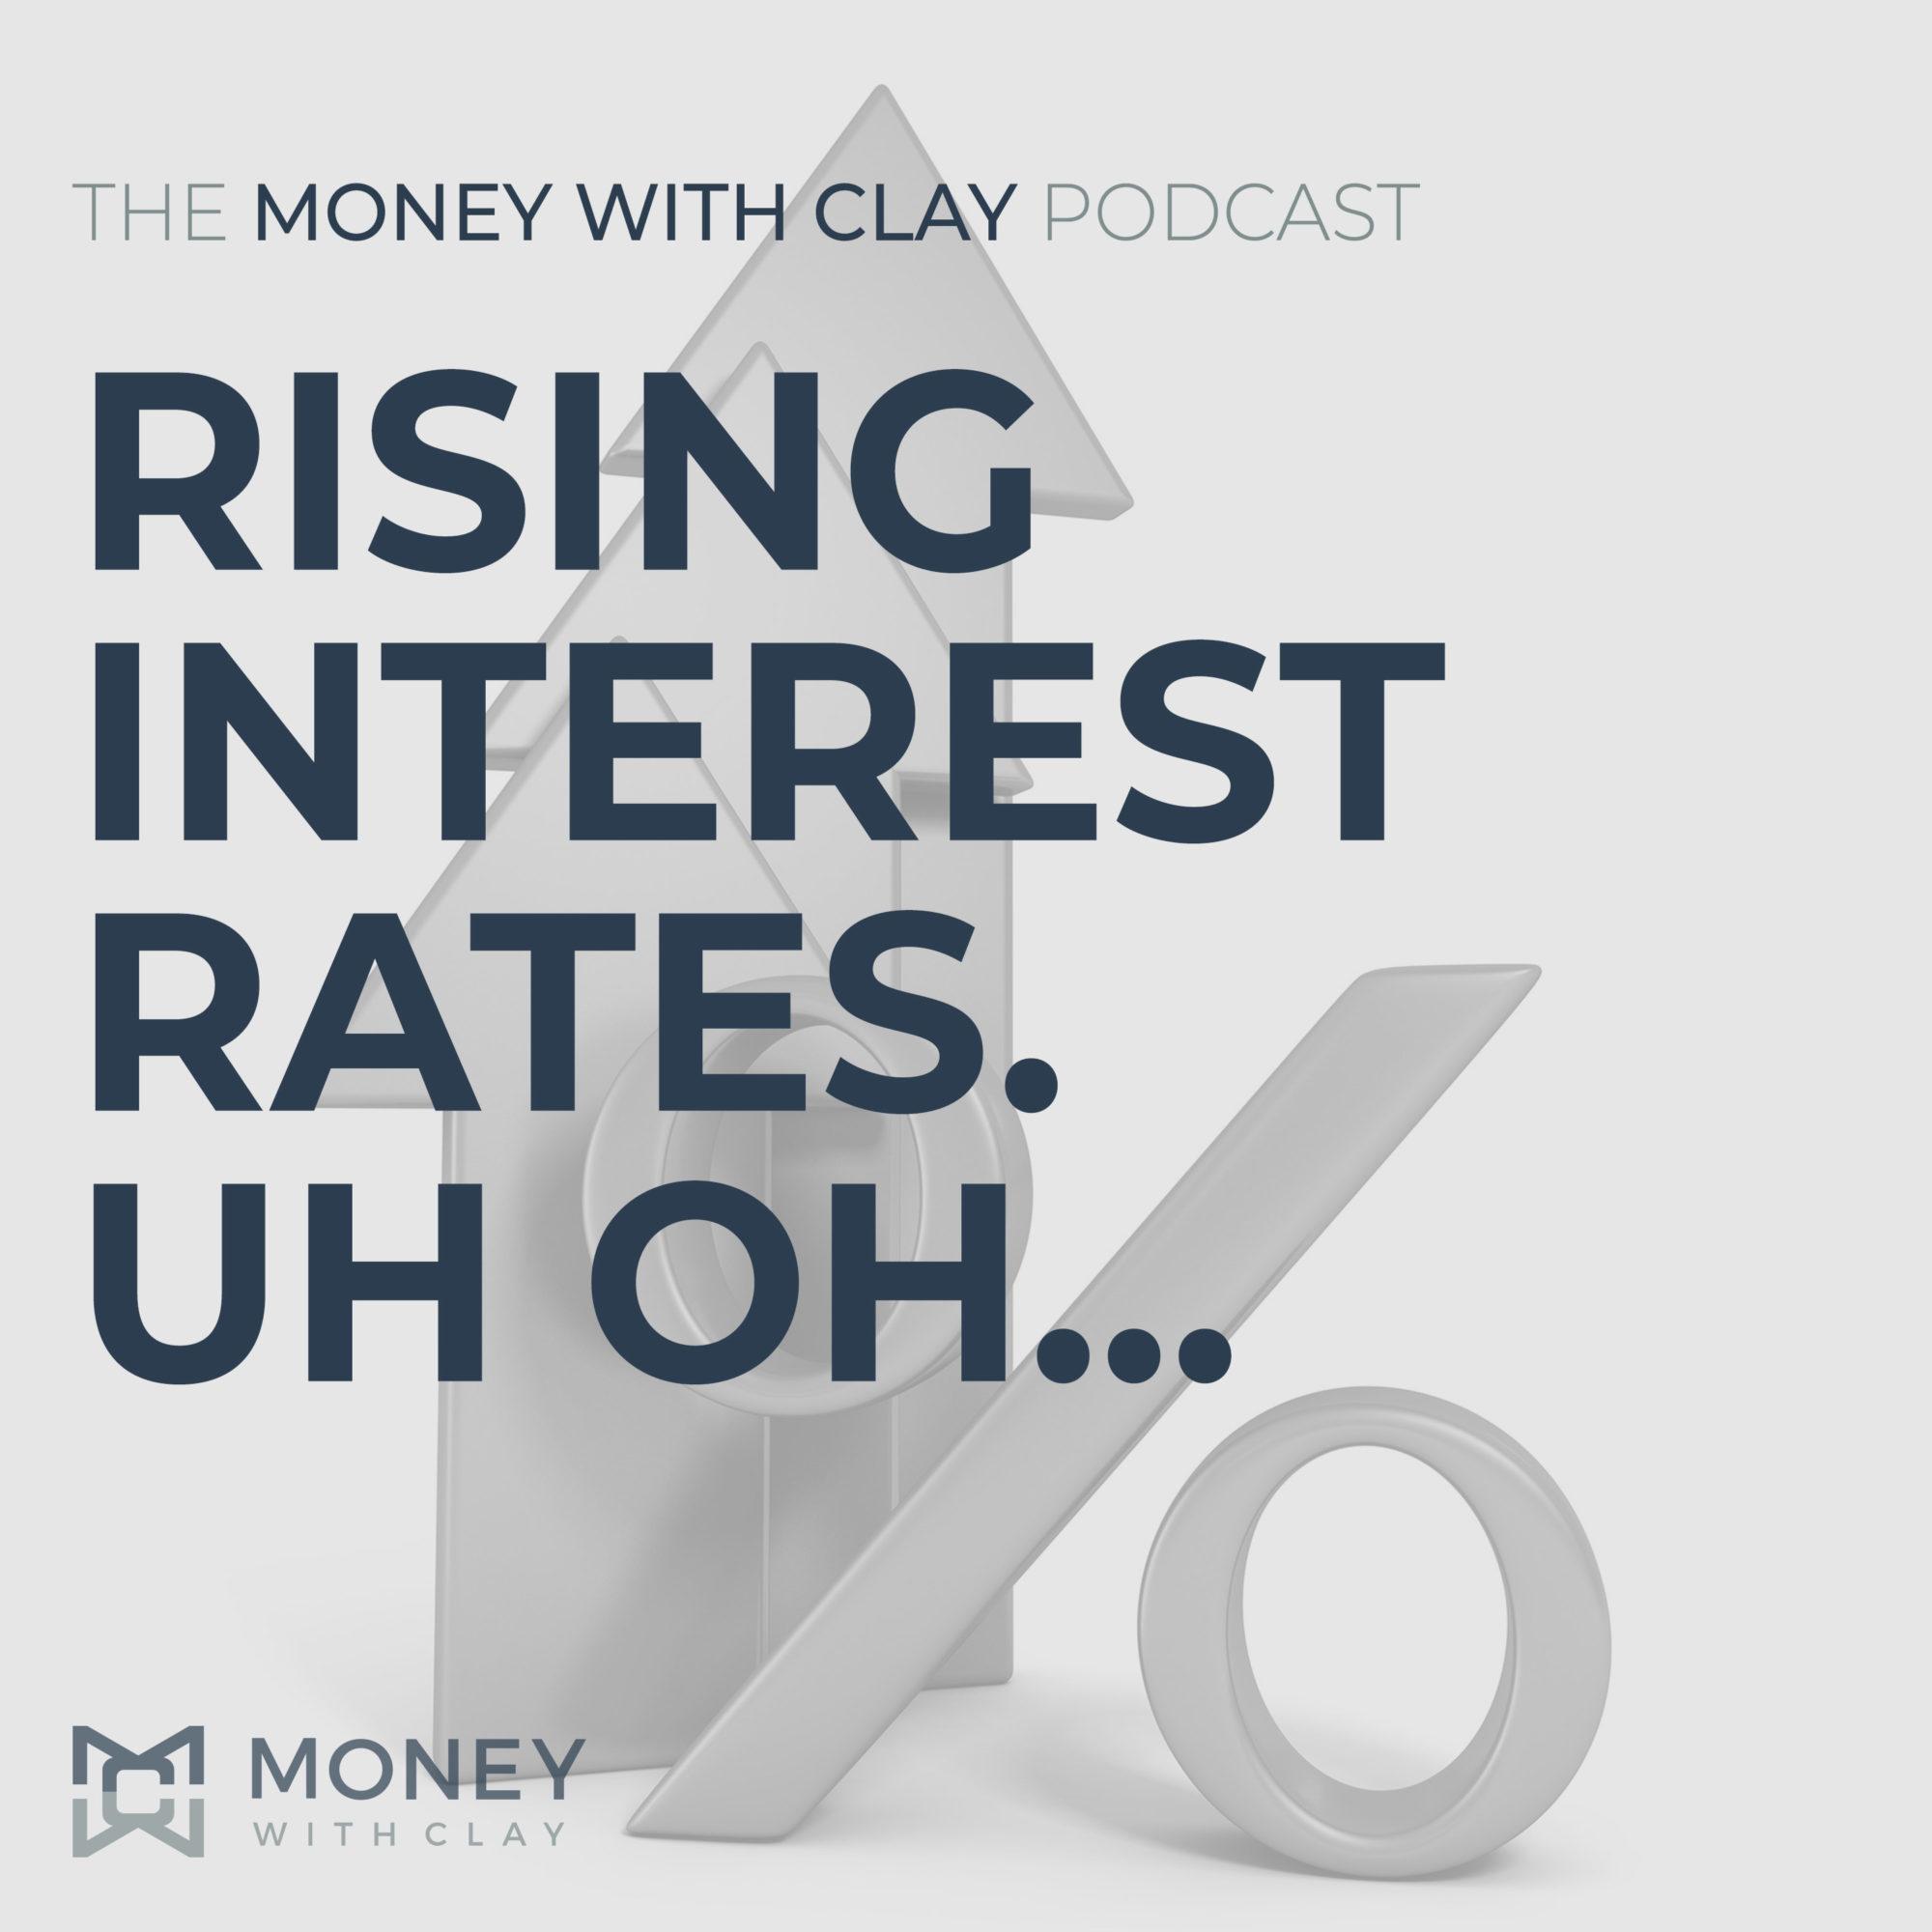 Rising Interest Rates. Uh Oh...